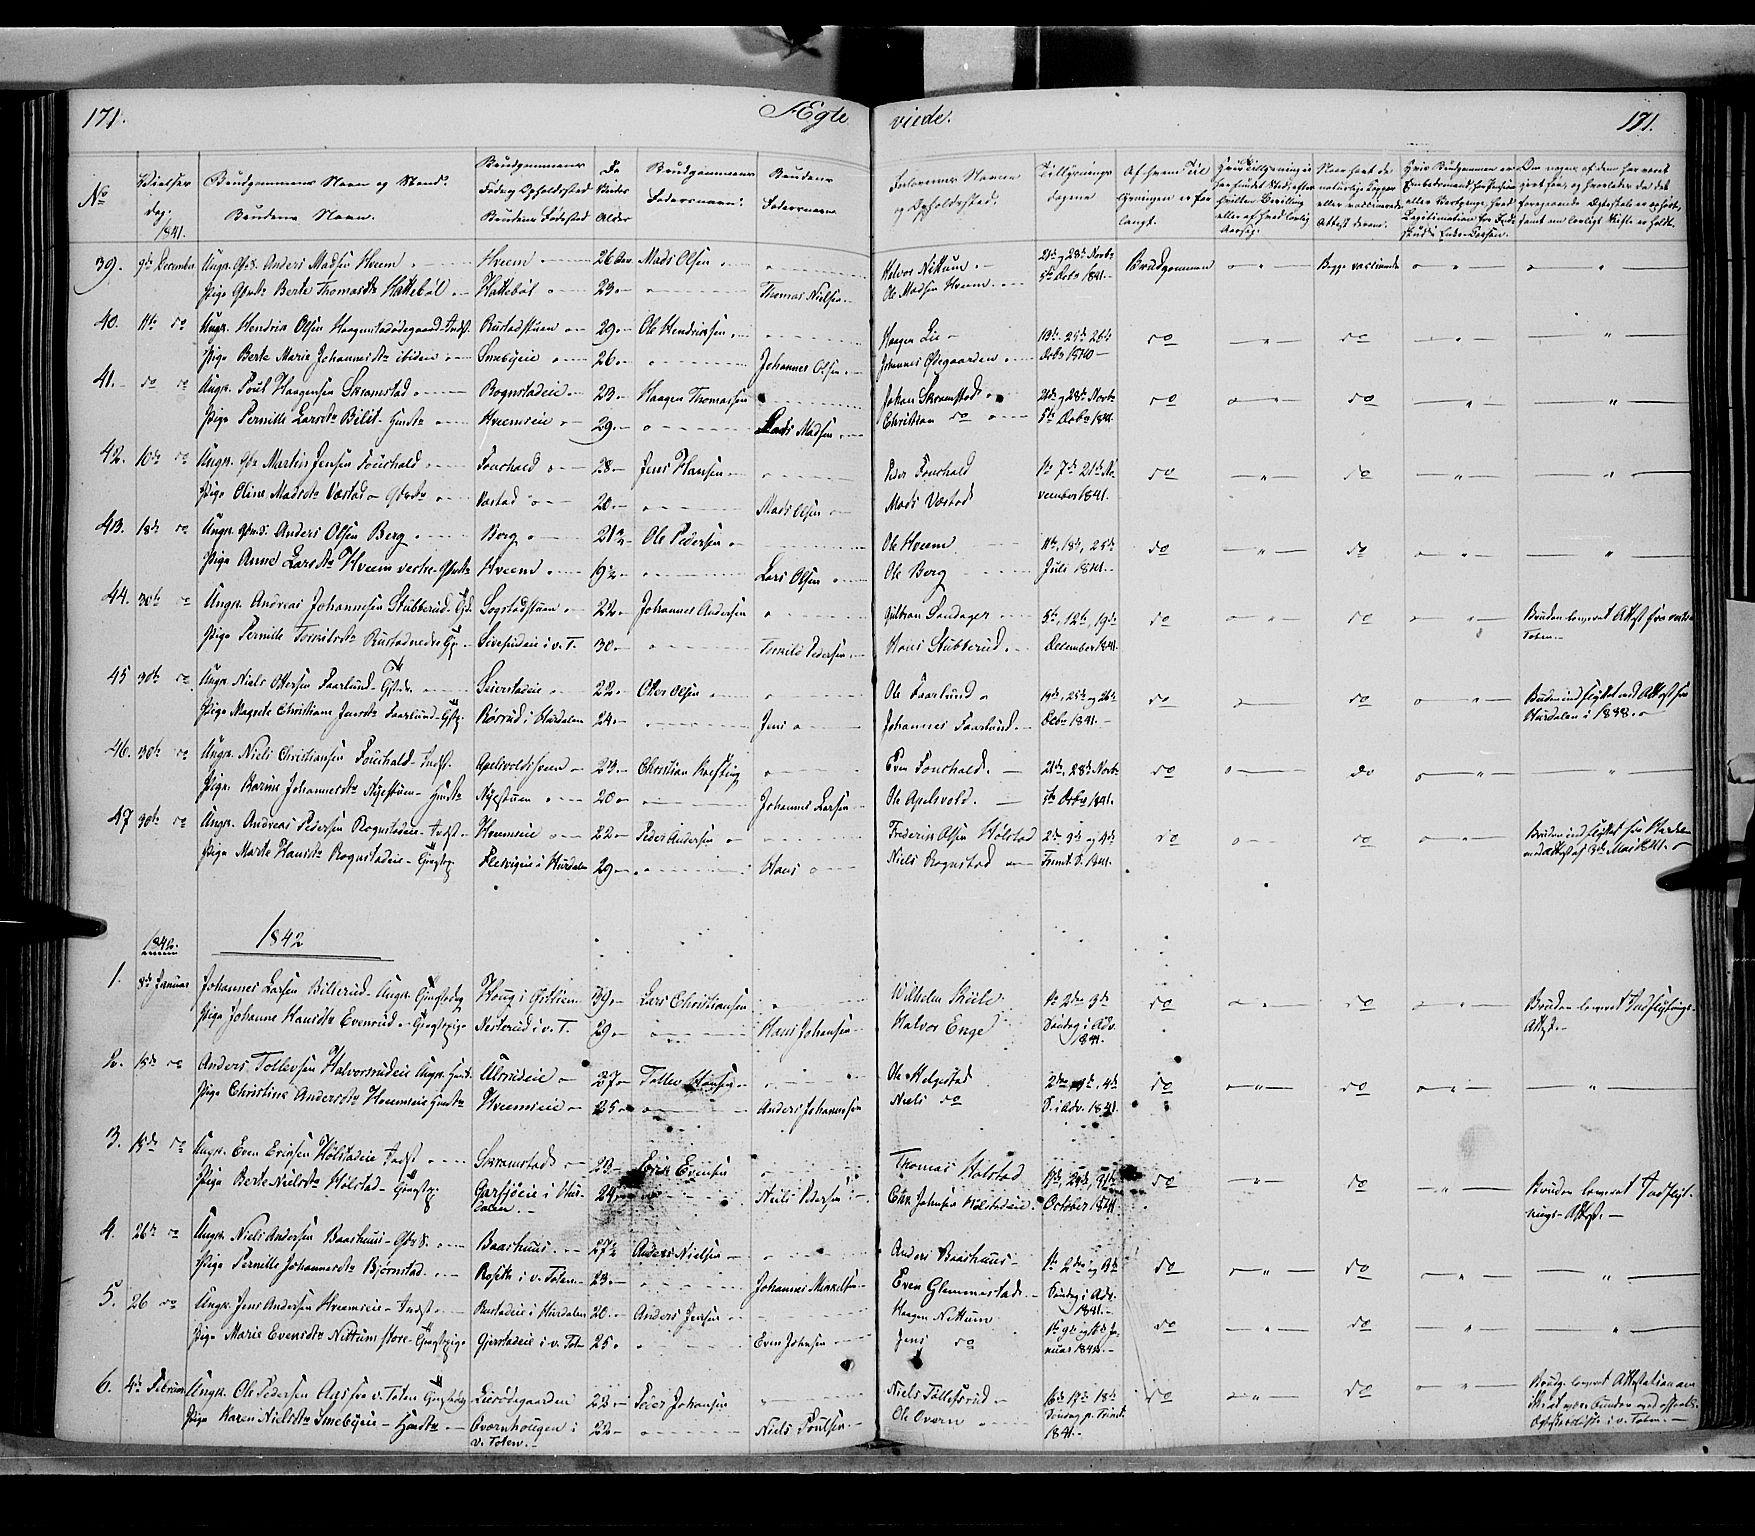 SAH, Østre Toten prestekontor, Ministerialbok nr. 2, 1840-1847, s. 171